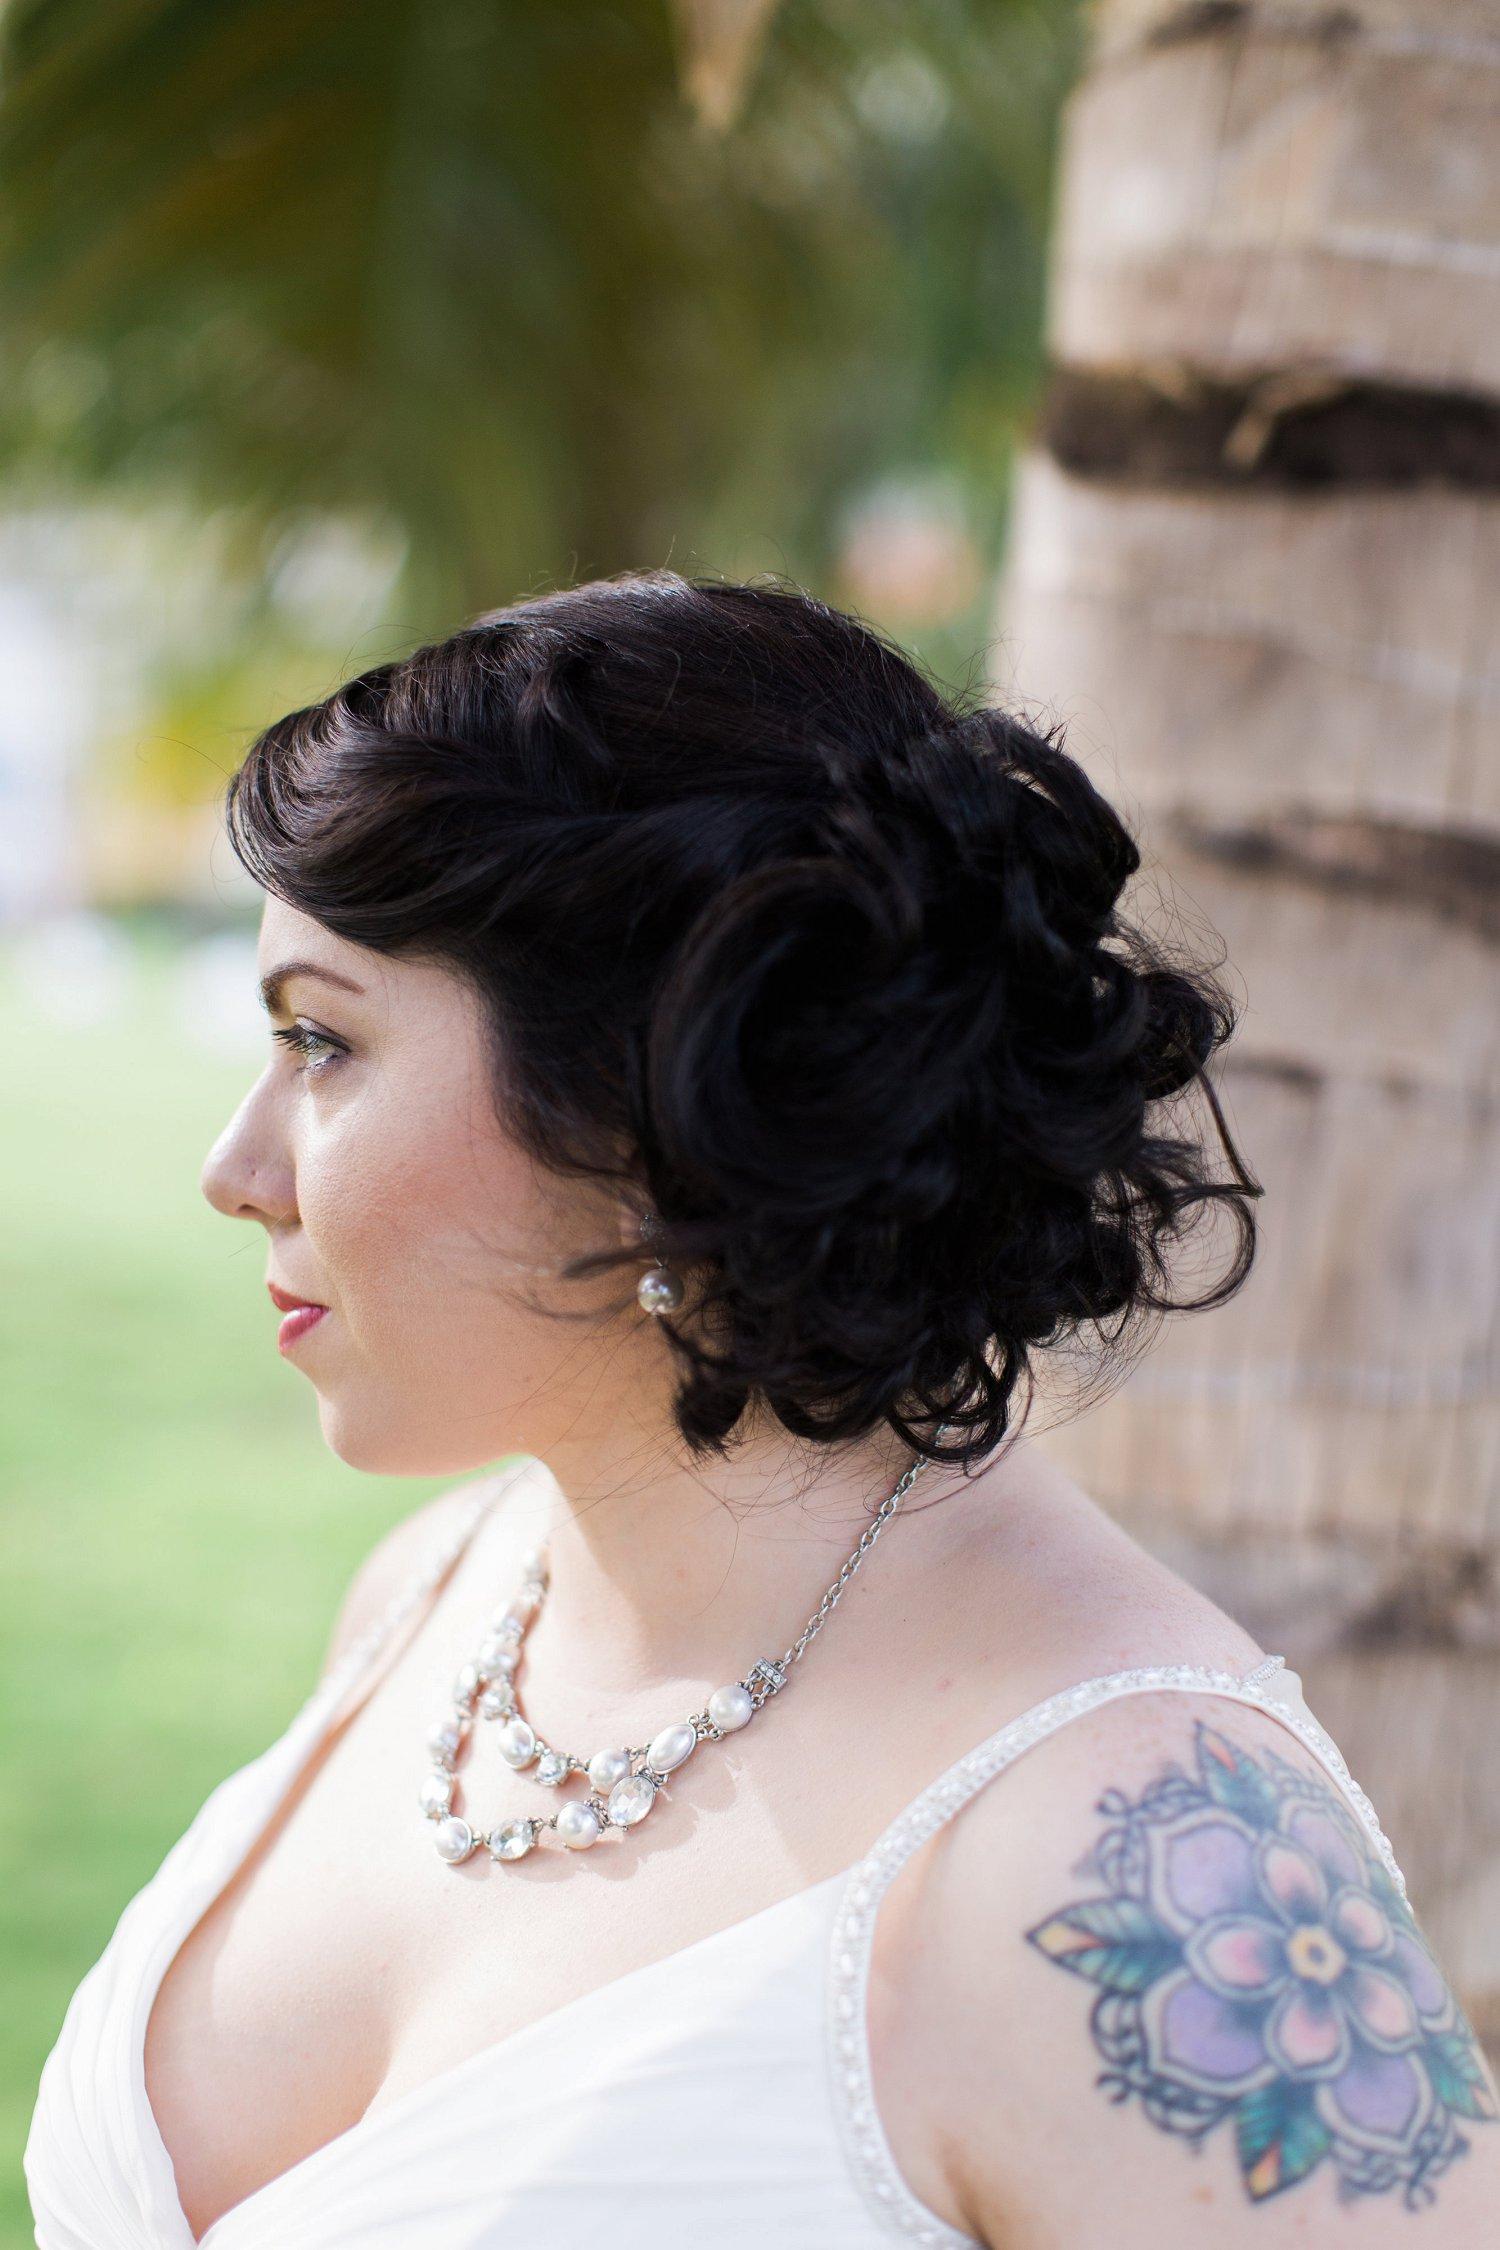 Bridal portrait by Savanah Loftus photography